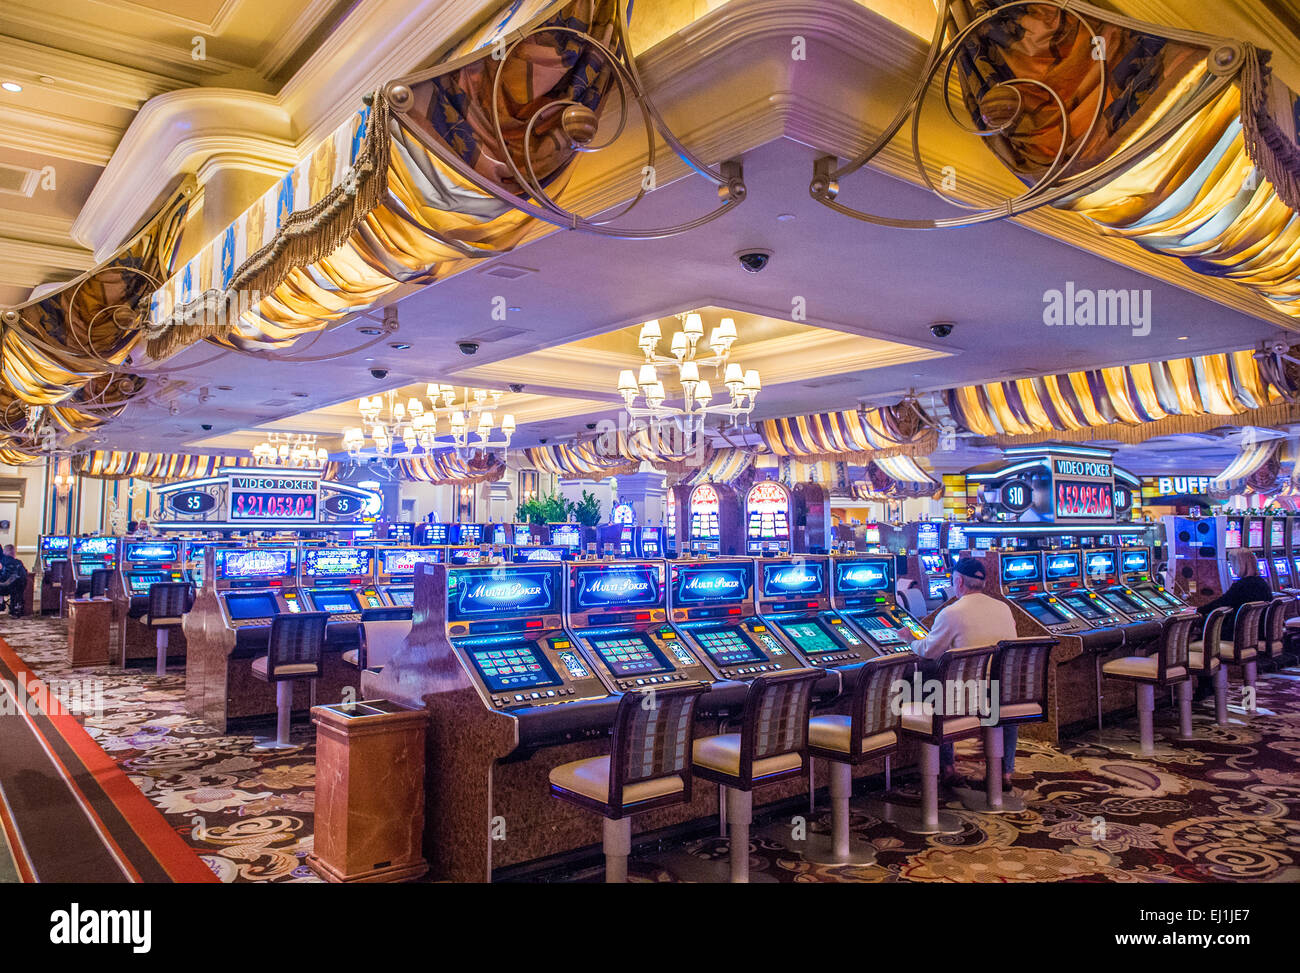 Das Innere Des Bellagio Hotel Und Casino In Las Vegas Stockfoto